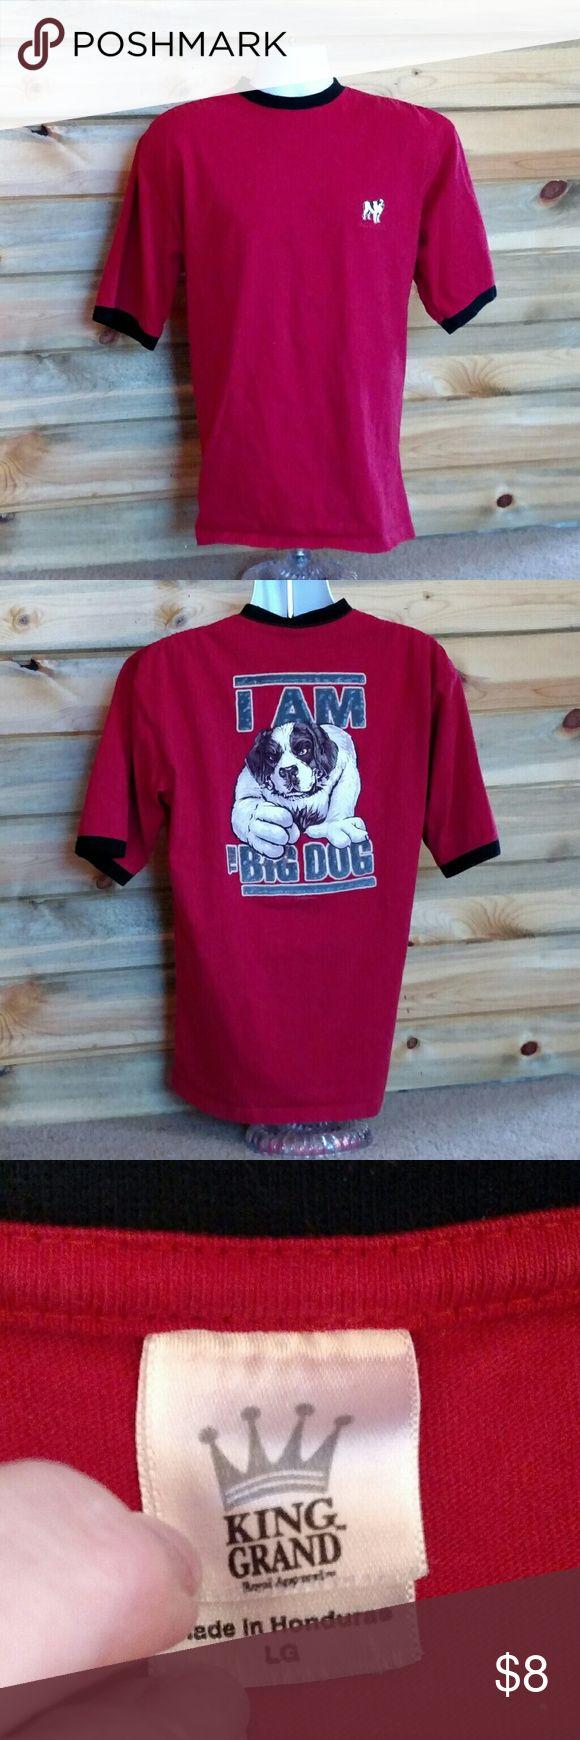 Old school Big Dog t-shirt Let's go old school! Nice, GUC Big Dog t-shirt. No rips, holes or stains. Smoke-free home. Big Dog Shirts Tees - Short Sleeve